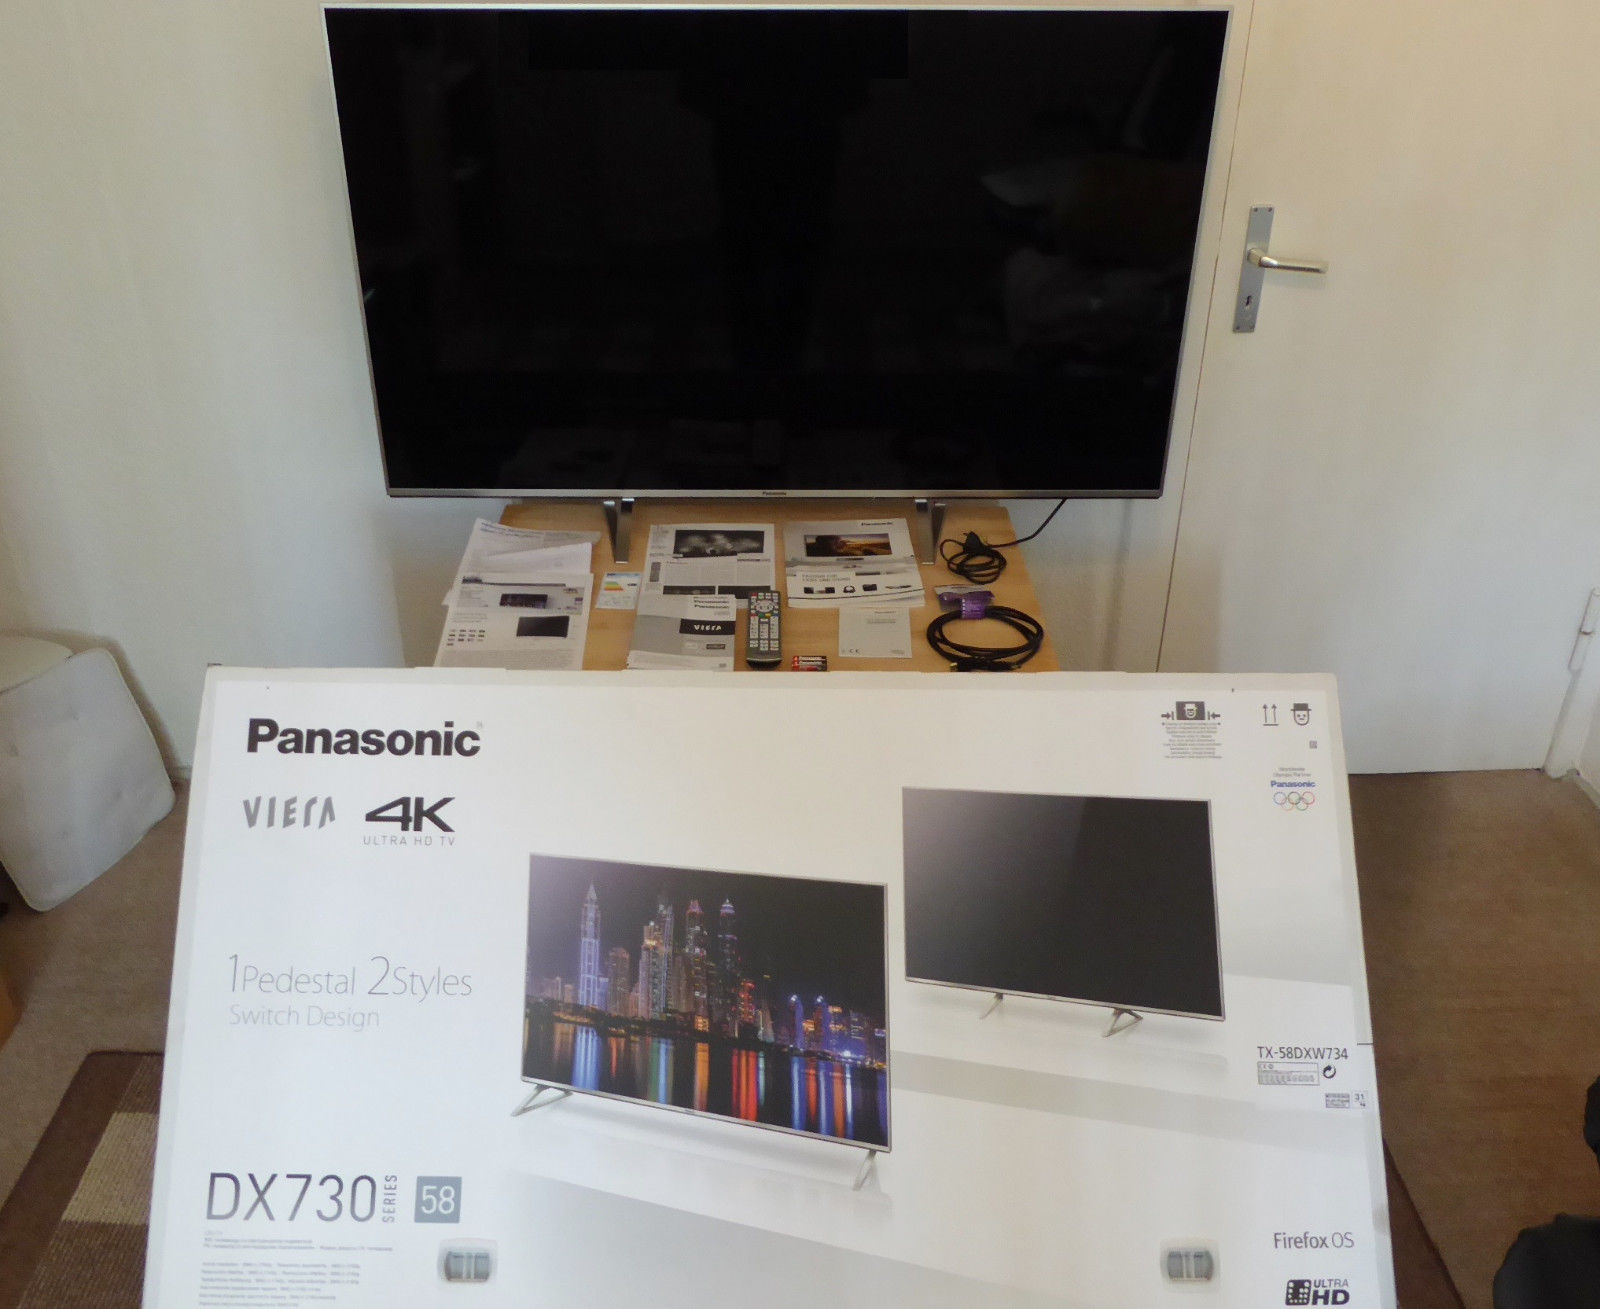 Panasonic TX-58DXW734 LED LCD 4K UHD Smart TV,146cm,58